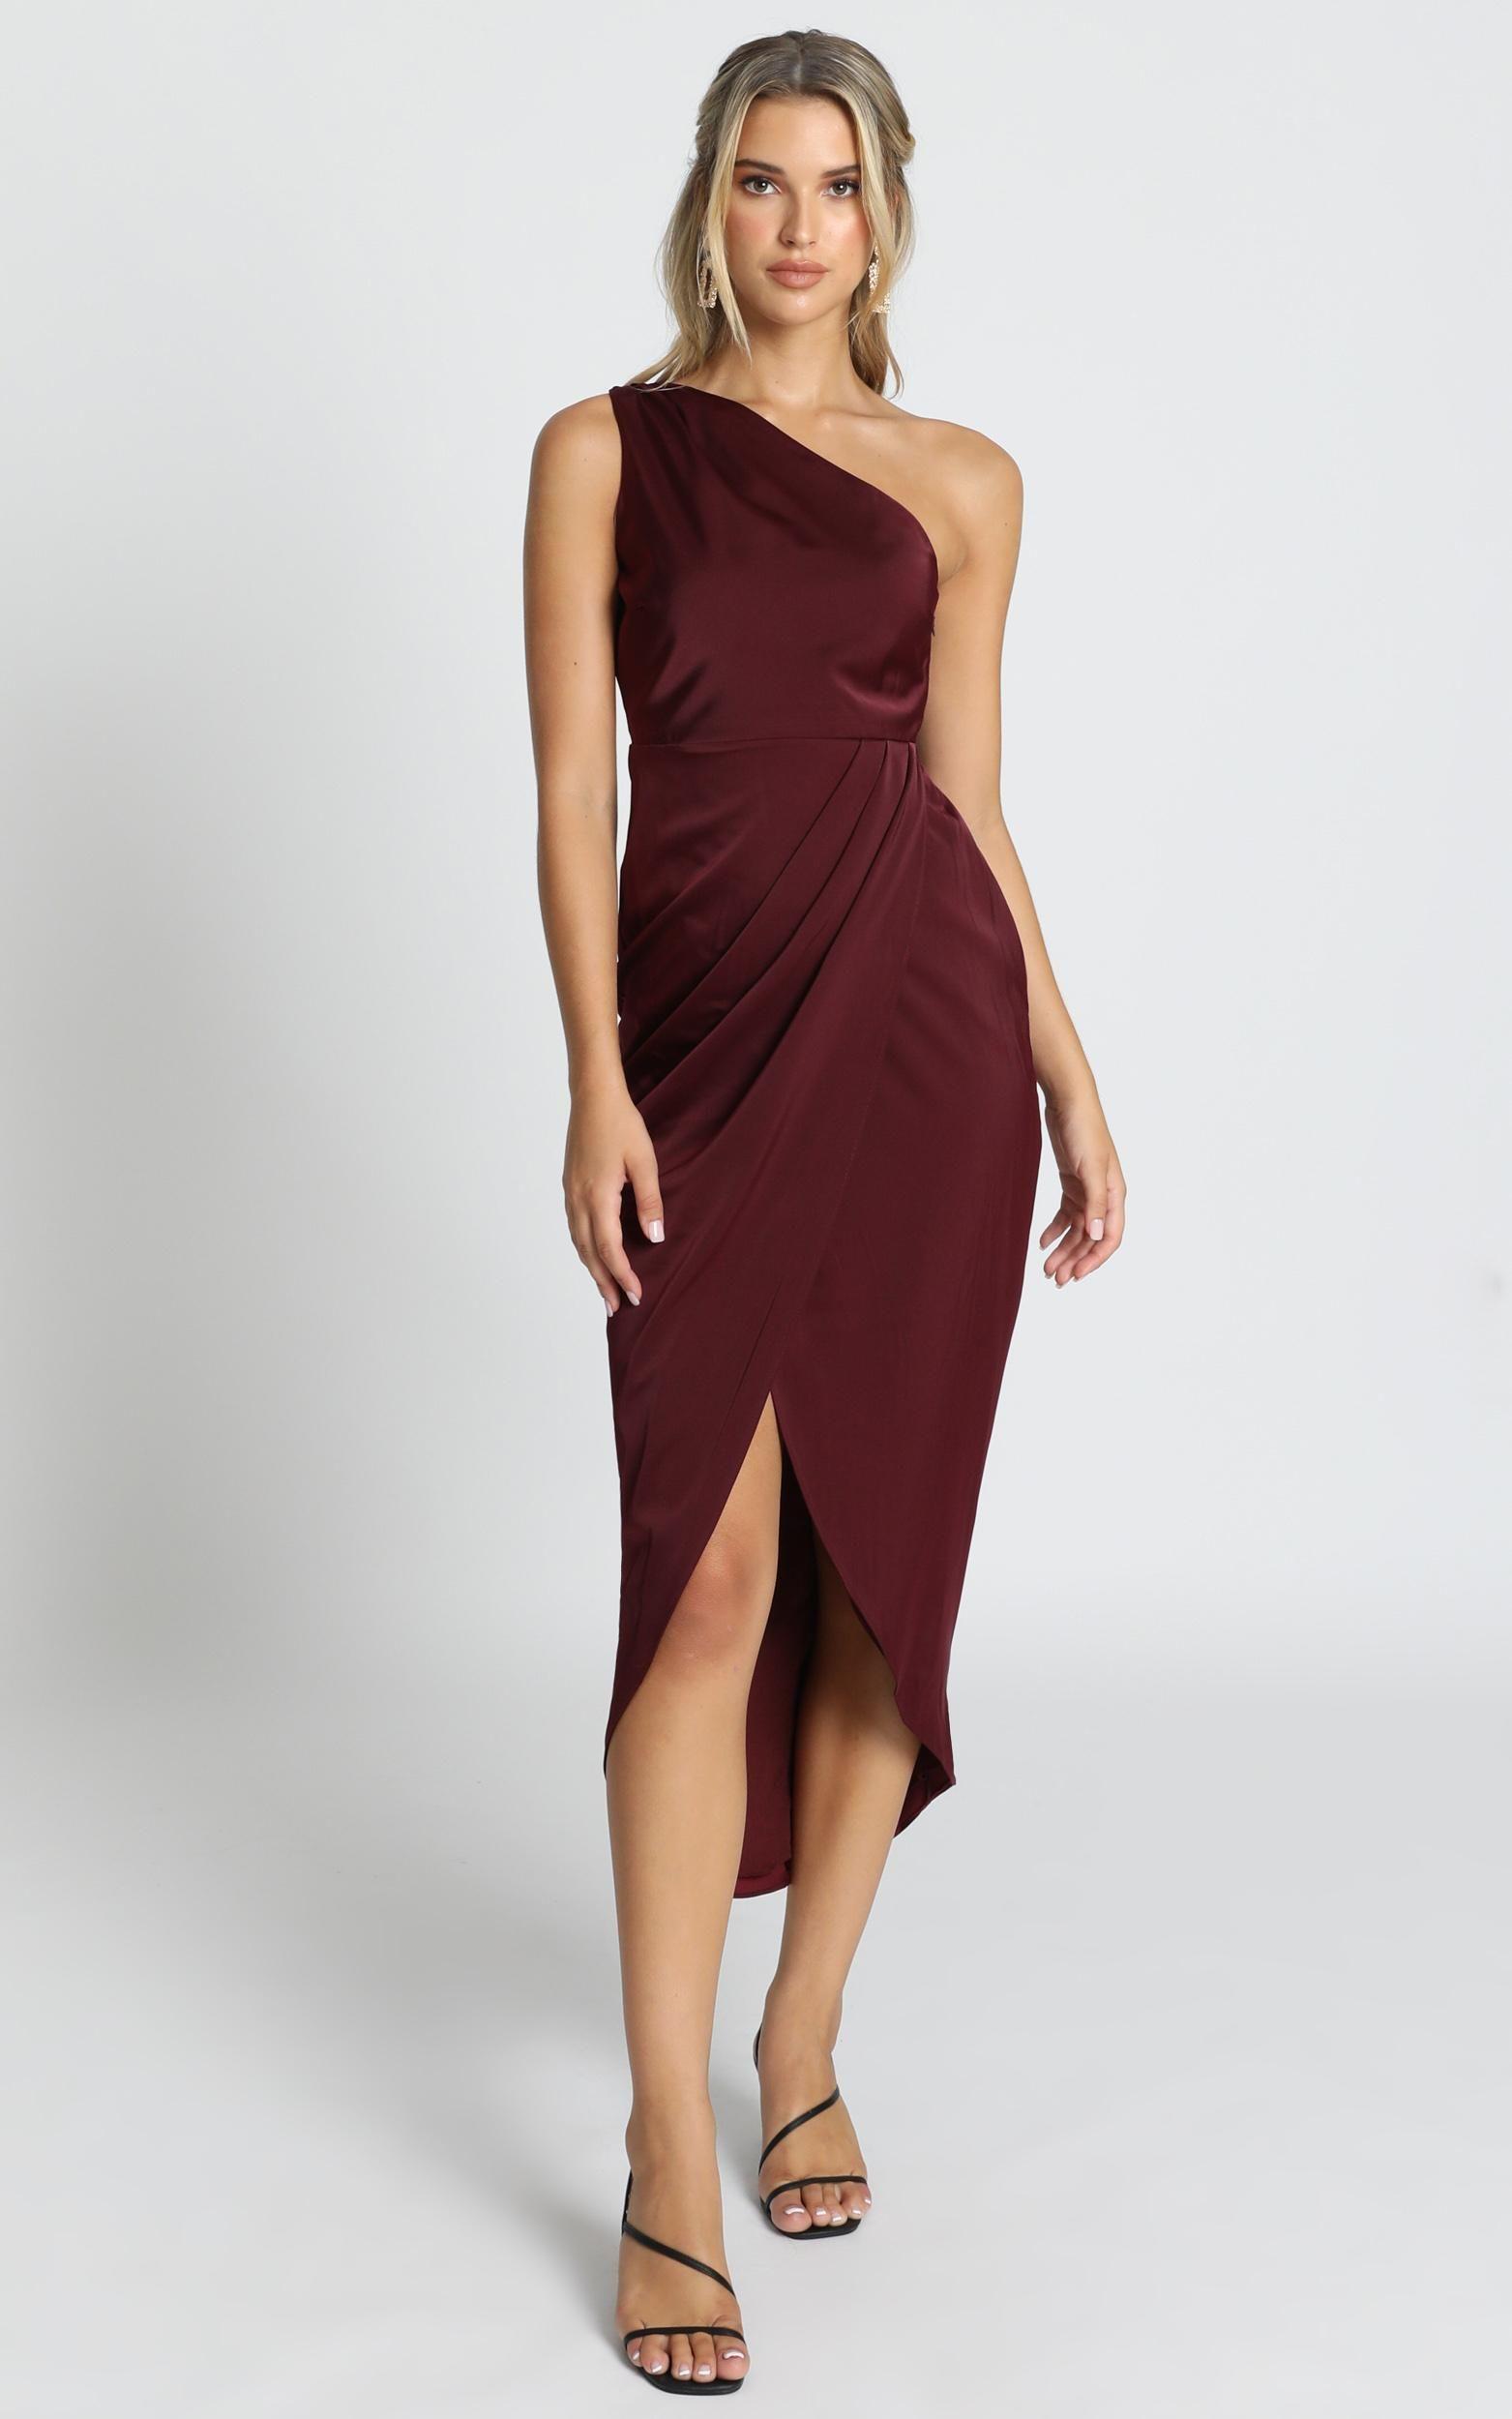 Felt So Happy Dress In Wine Showpo Happy Dresses Dresses Wine Colored Dresses [ 2500 x 1563 Pixel ]